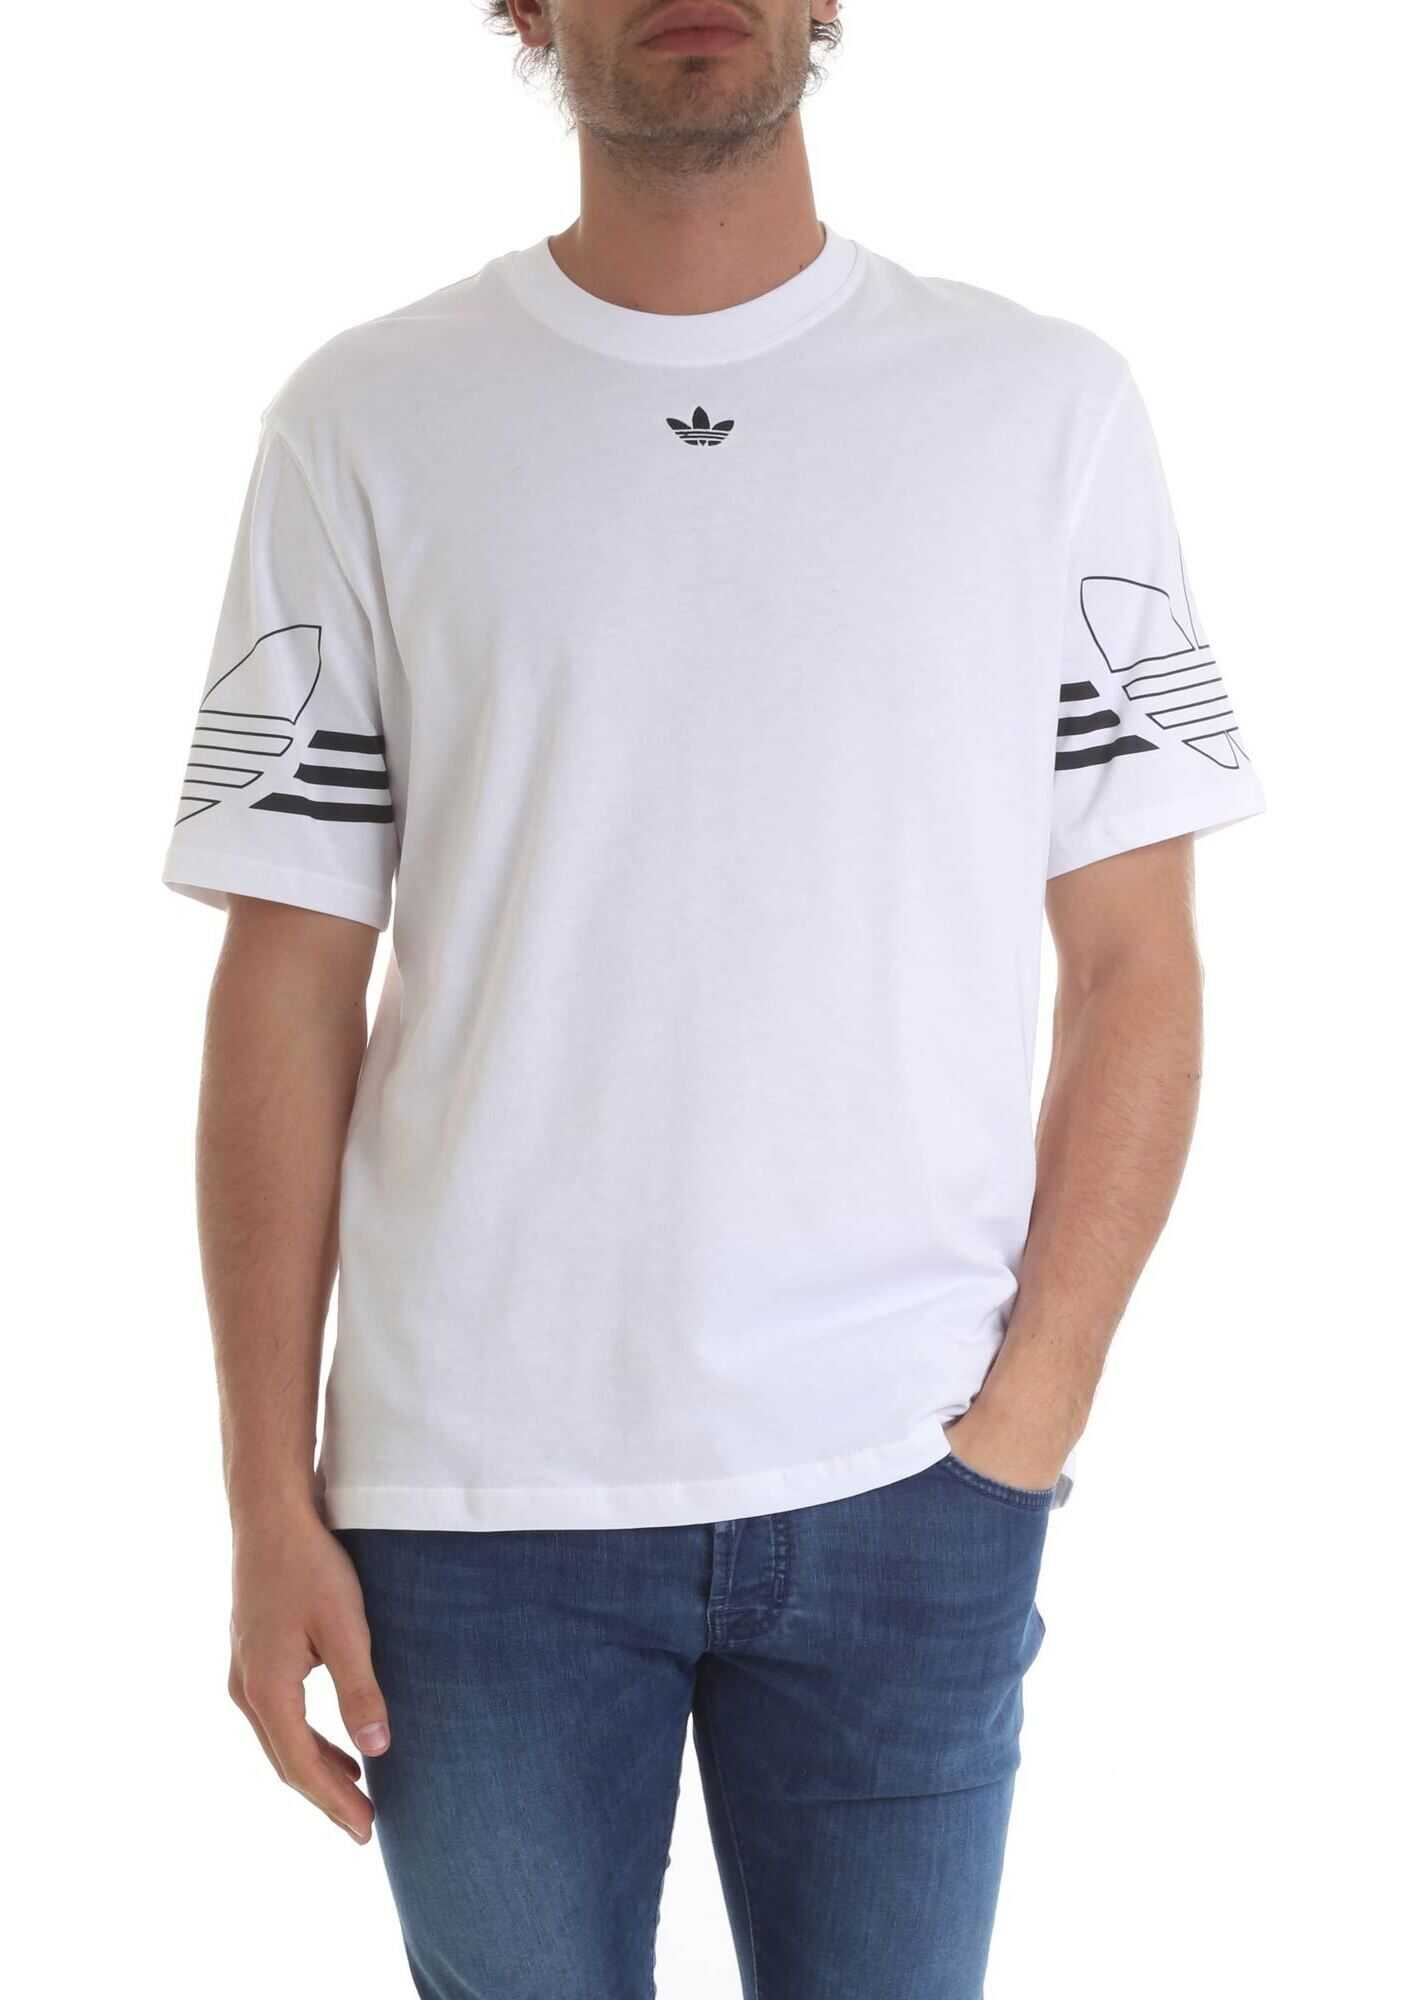 Adidas Originals Outline T-Shirt In White